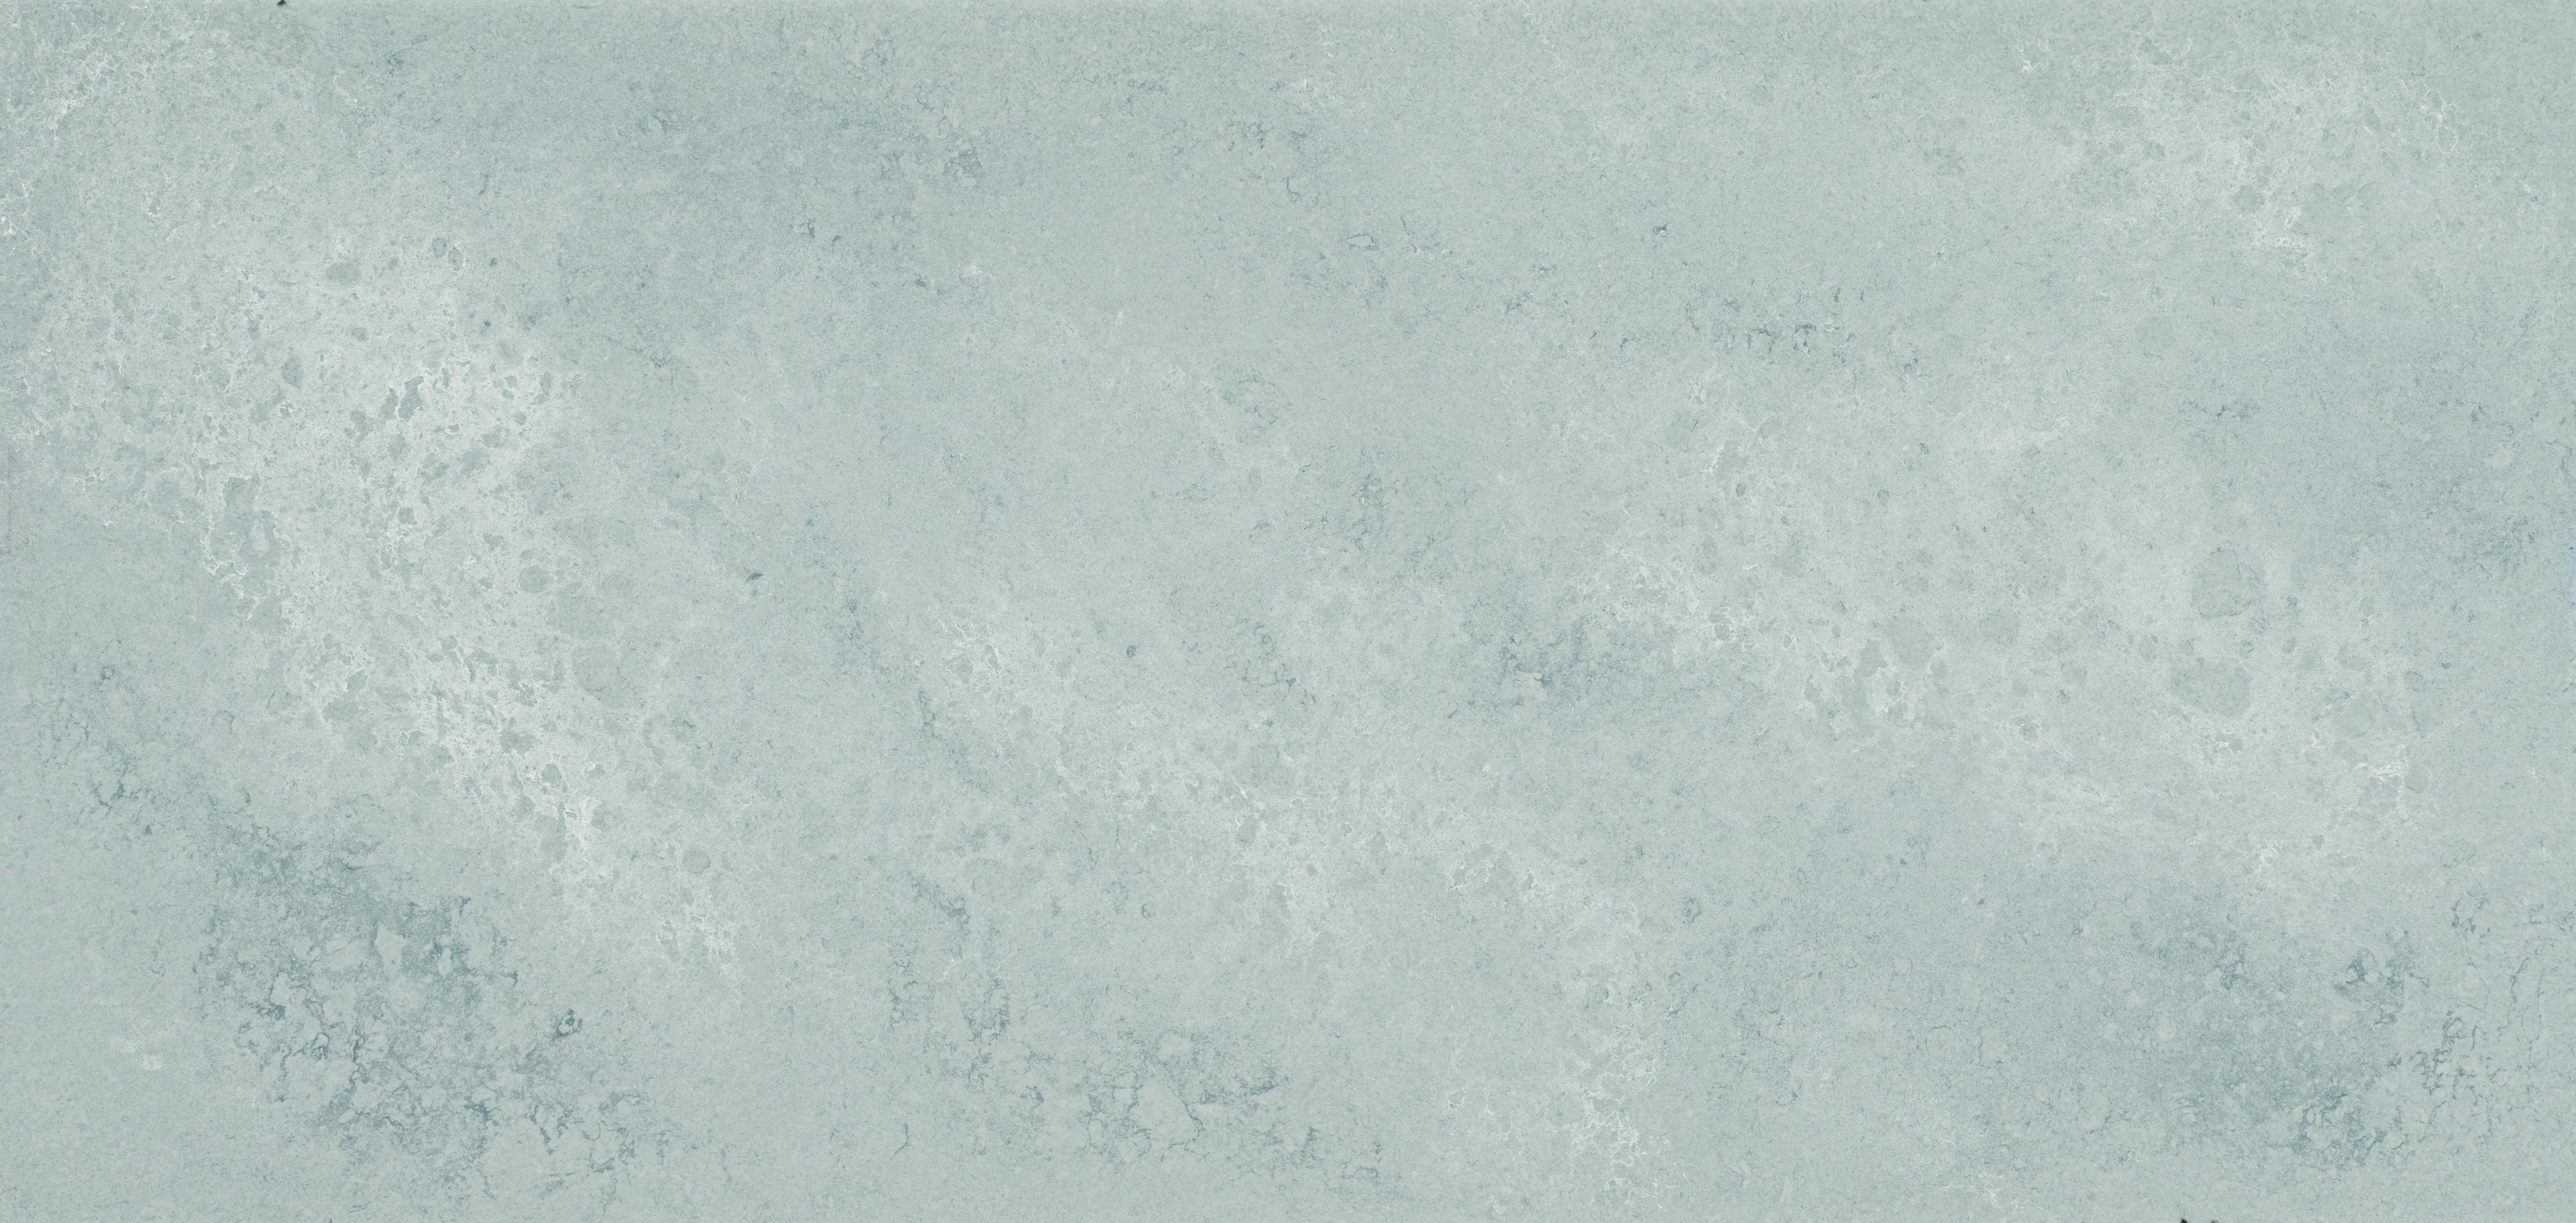 Caesarstone Classico - 4044 Airy Concrete™ | Elements of